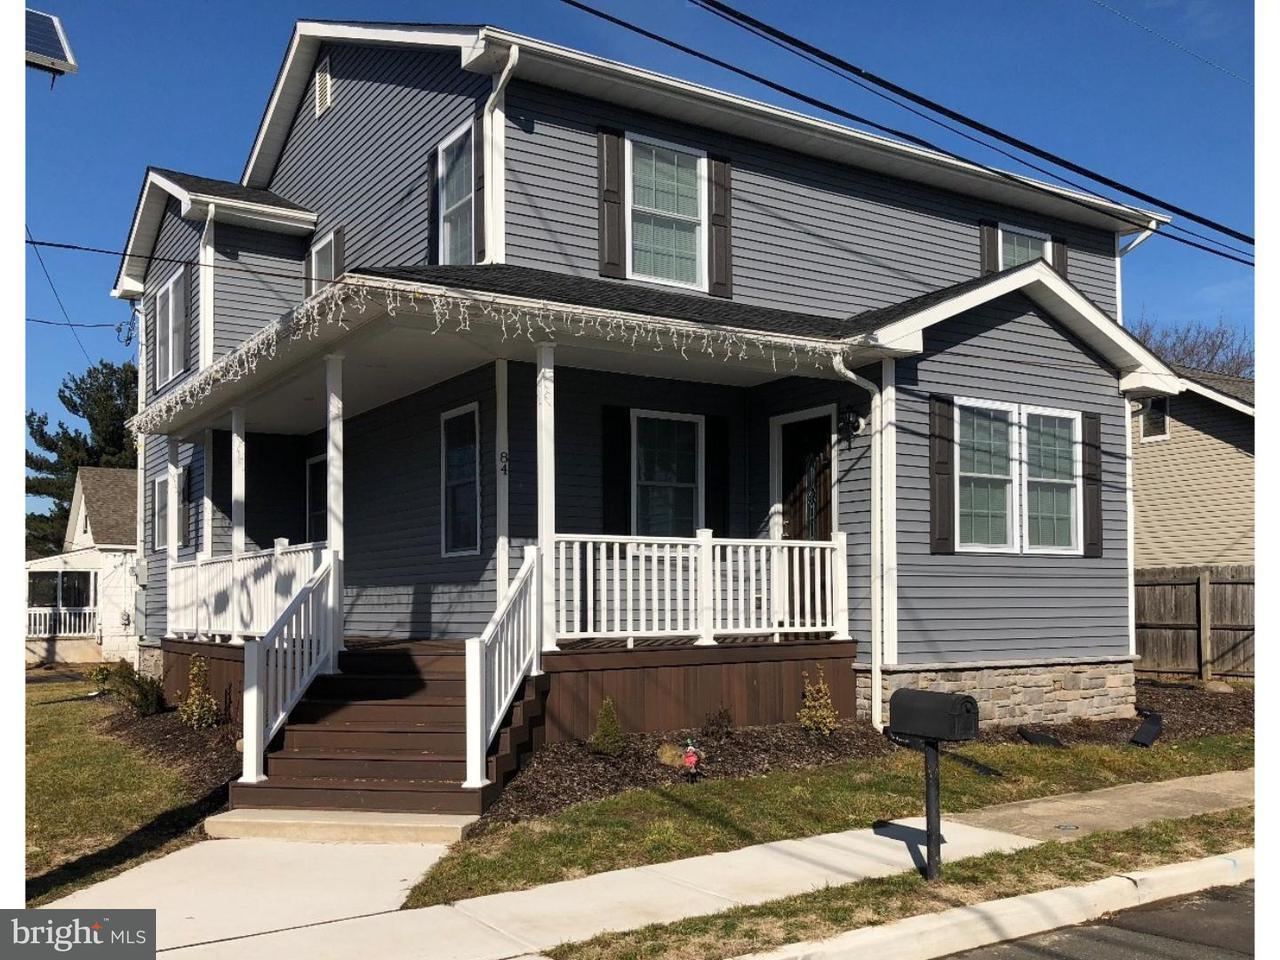 独户住宅 为 出租 在 84 POTTER Avenue Hamilton Township, 新泽西州 08619 美国在/周边: Hamilton Township